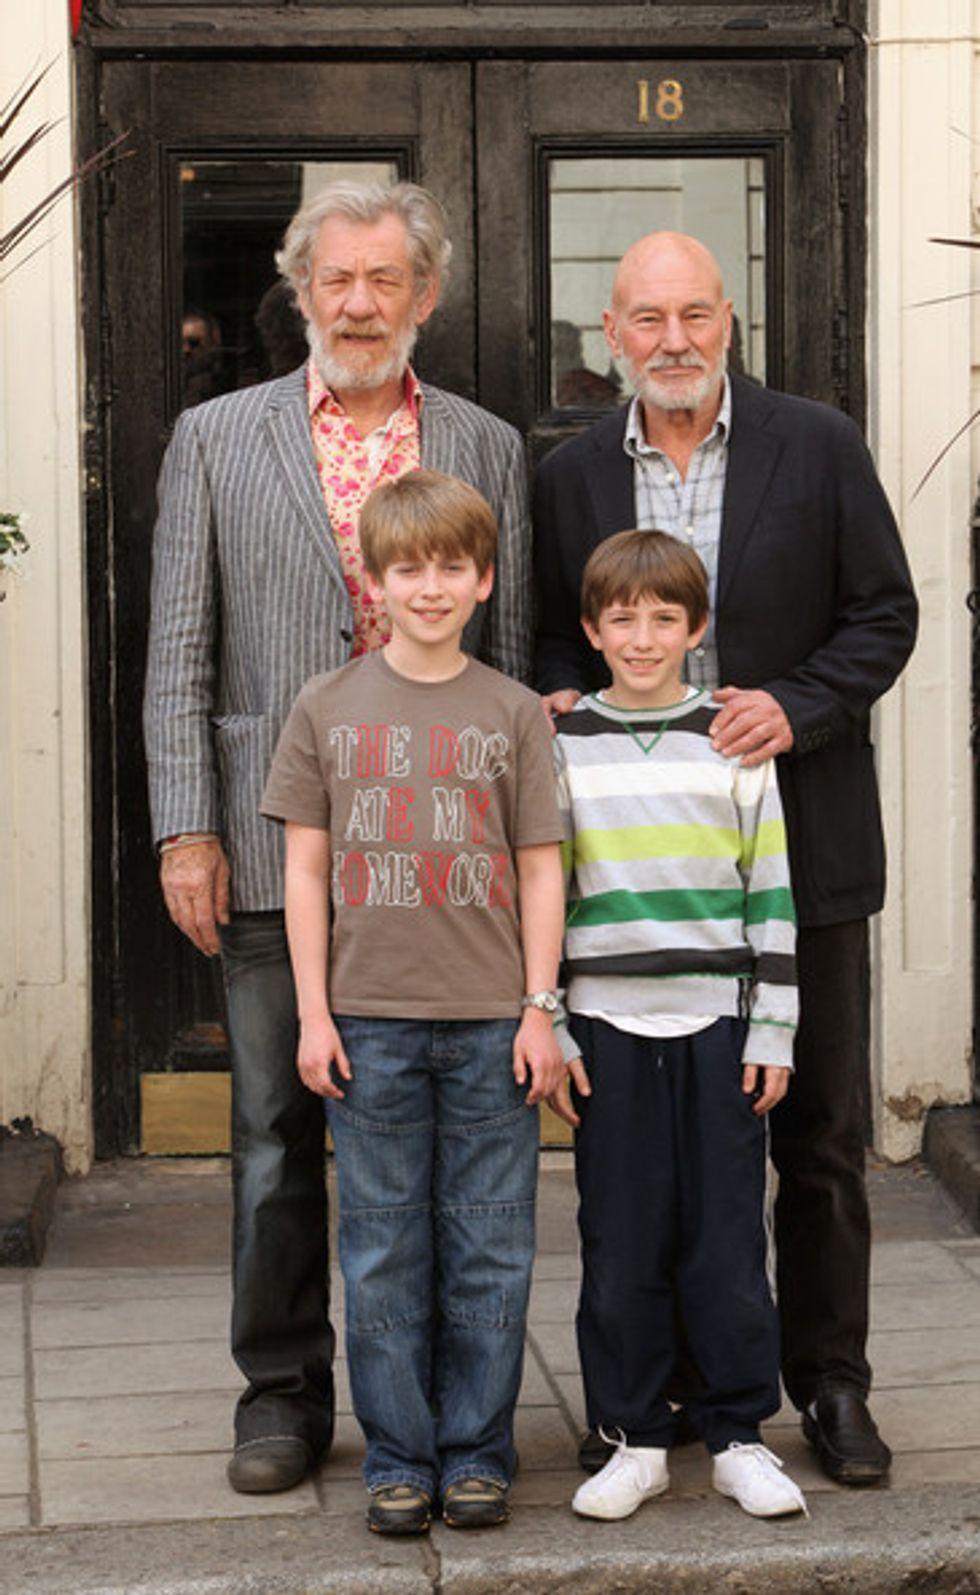 Patrick Stewart and Ian McKellan: A Salute to Their Broadway Bromance